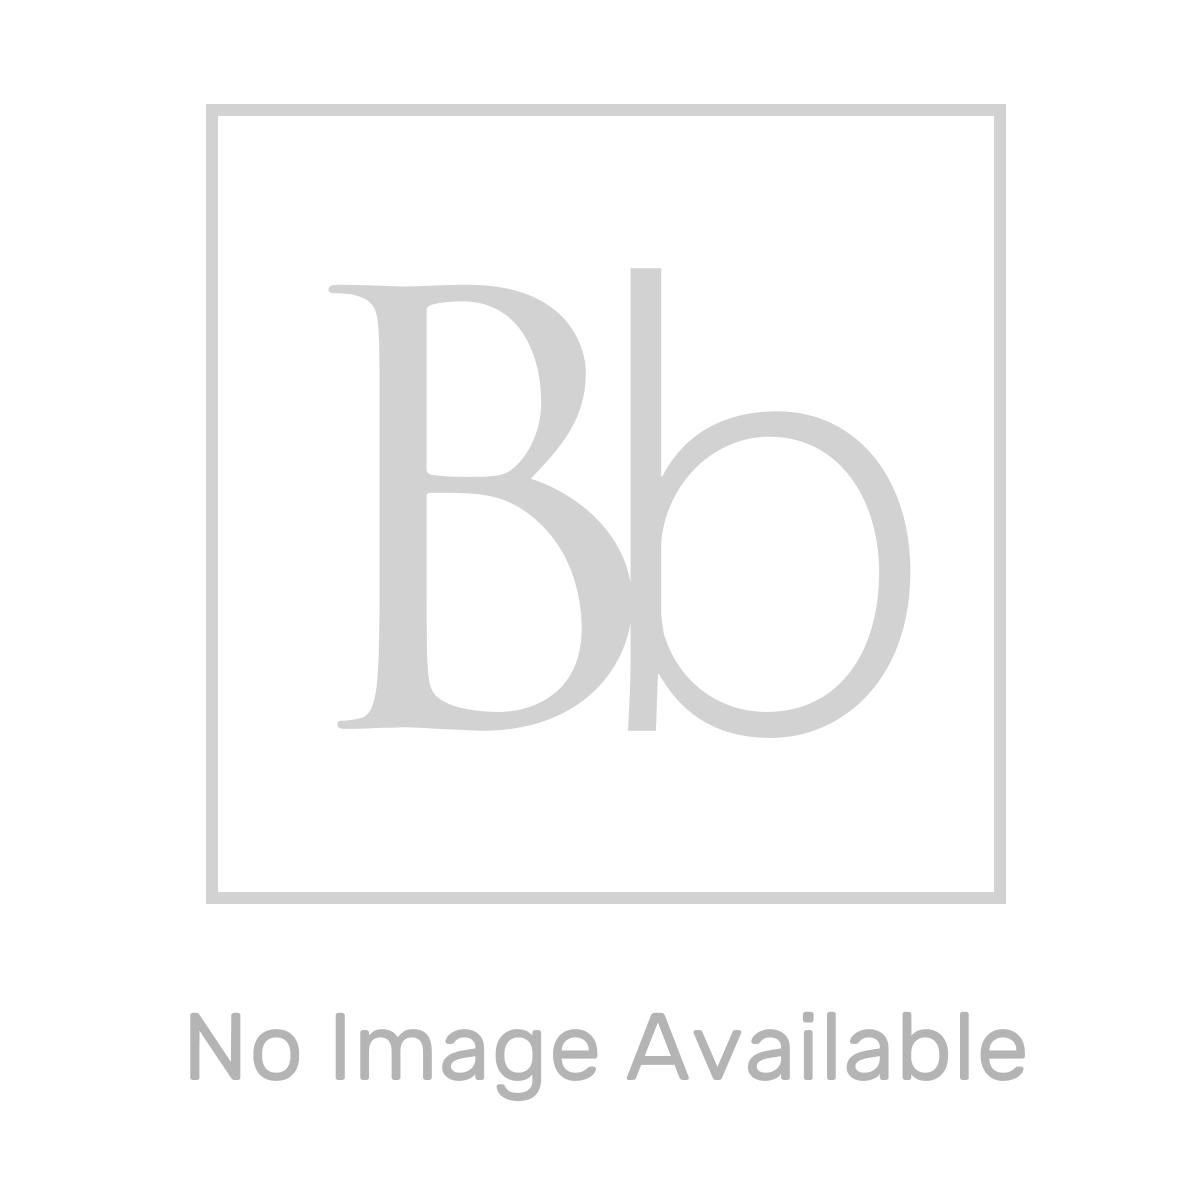 Aquadart White Slate Shower Tray 1700 x 800 Dimensions